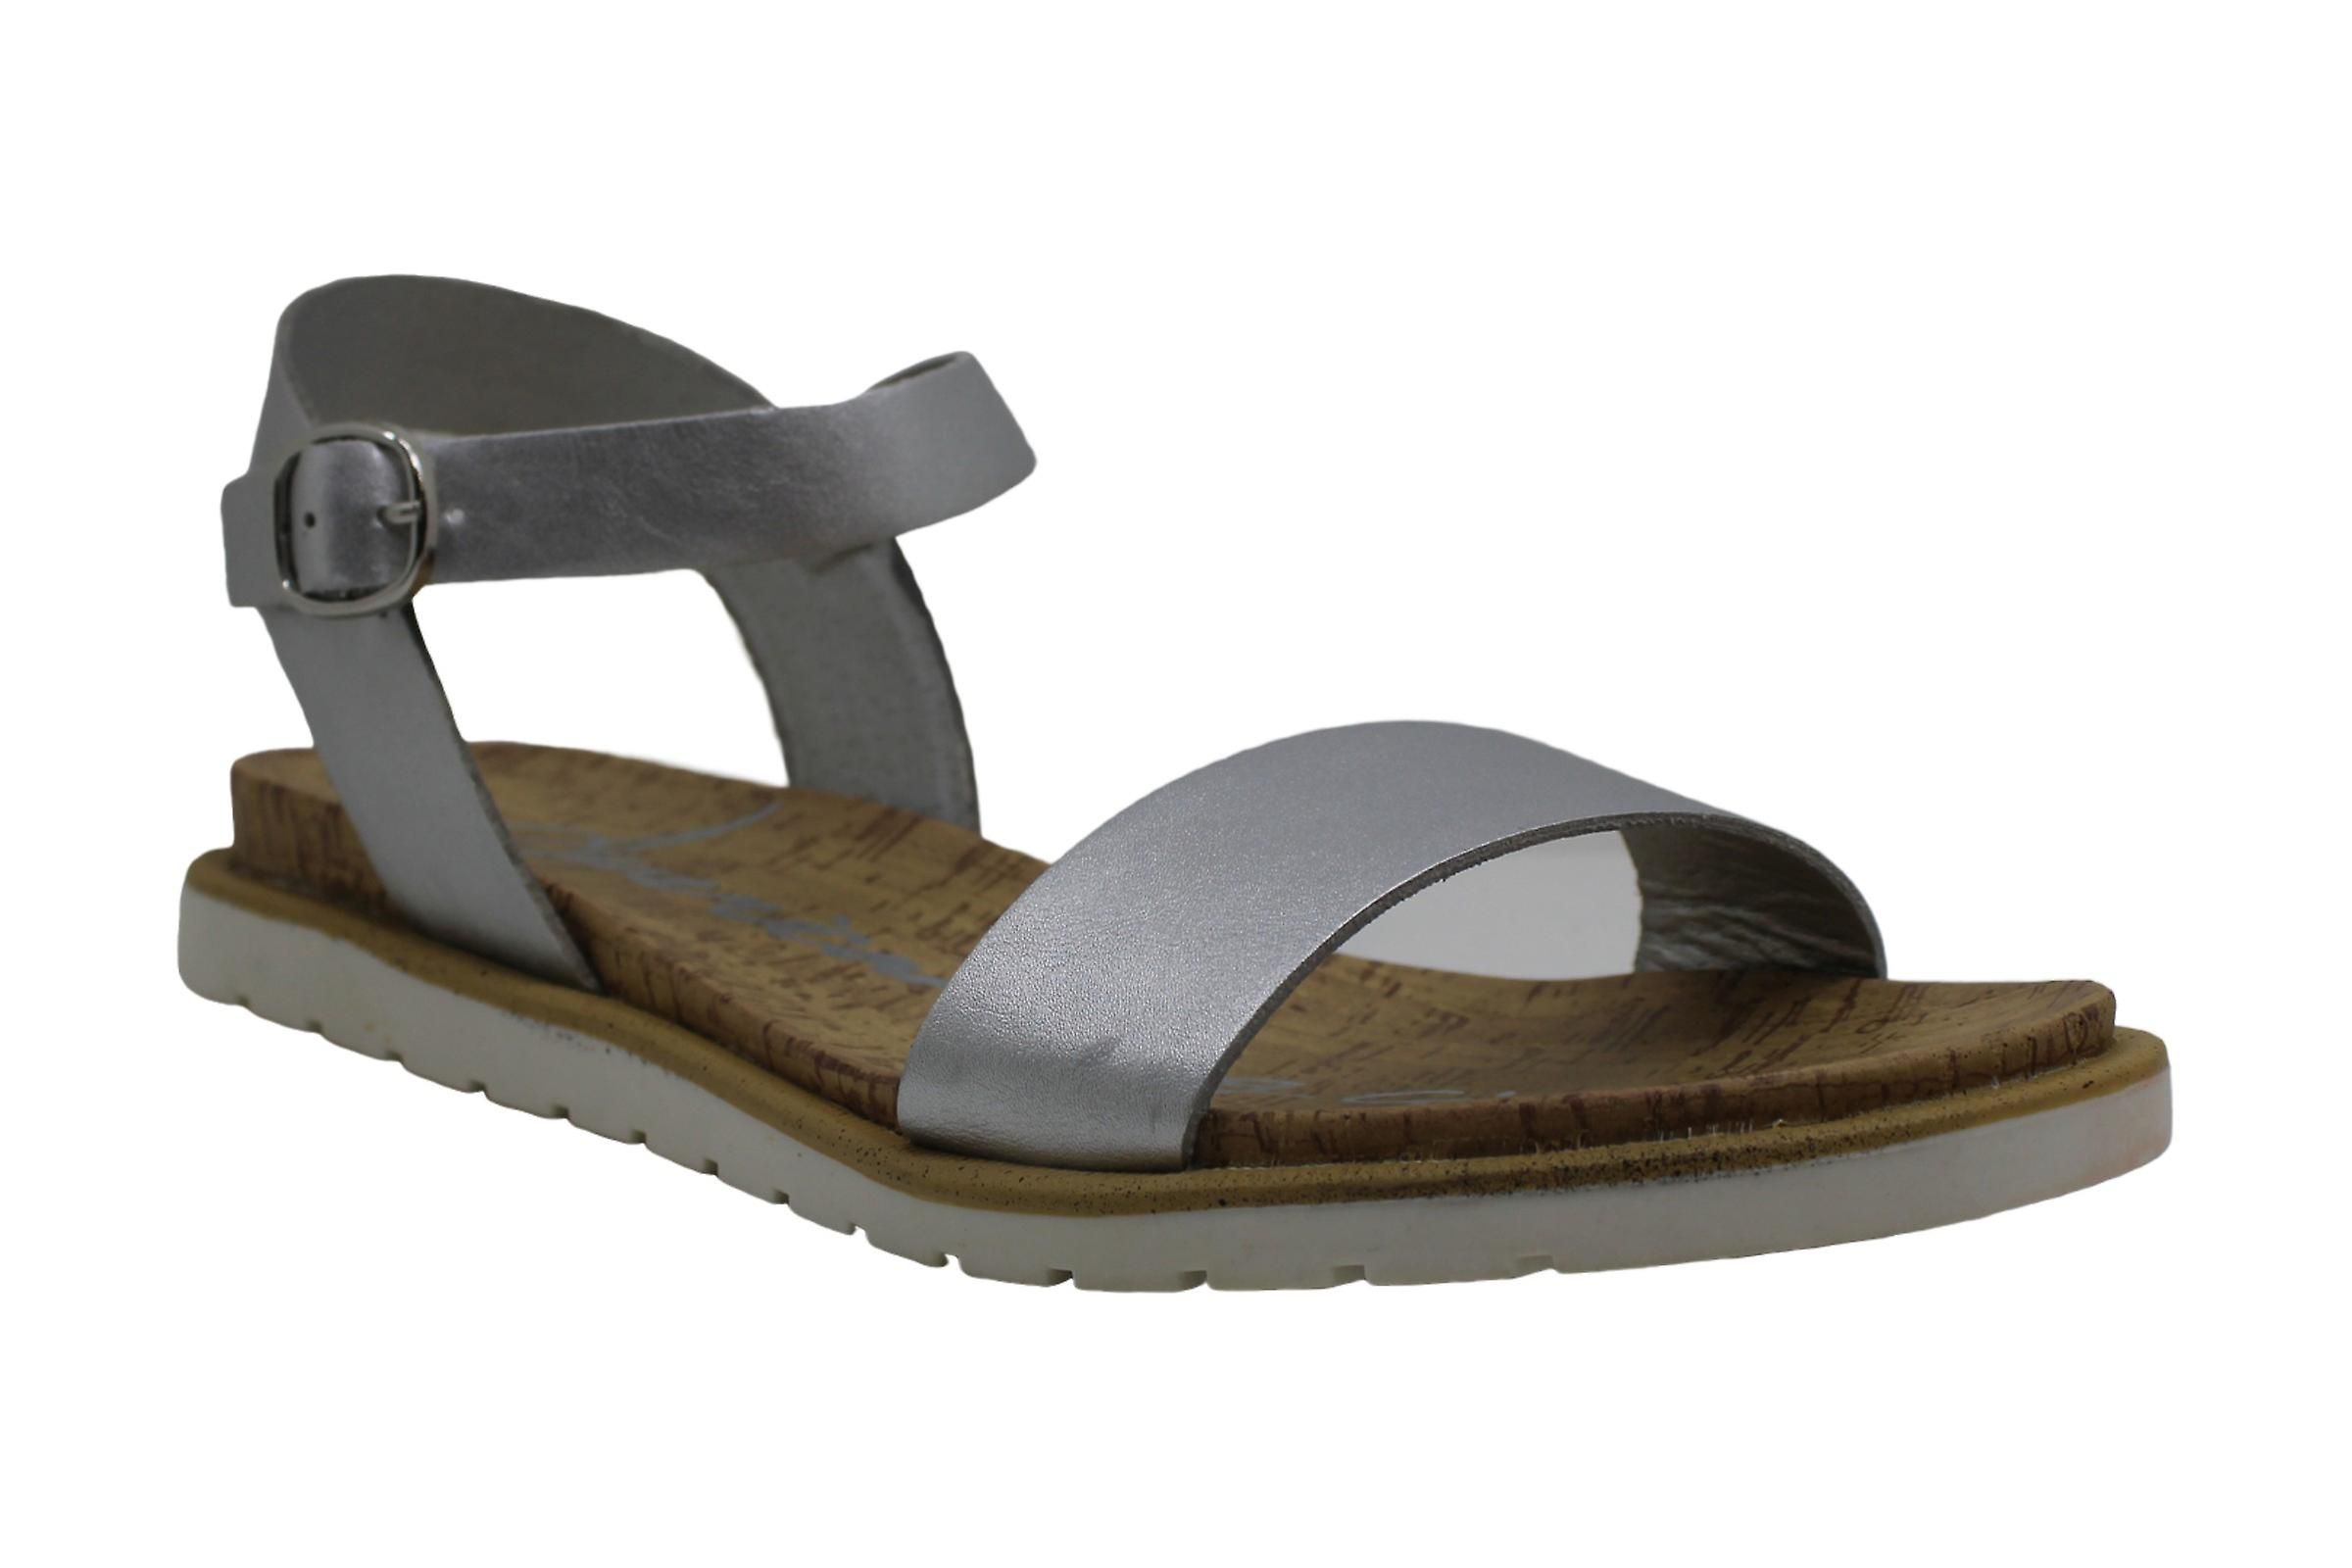 American Rag Womens mattie Open Toe Casual Slingback Sandals